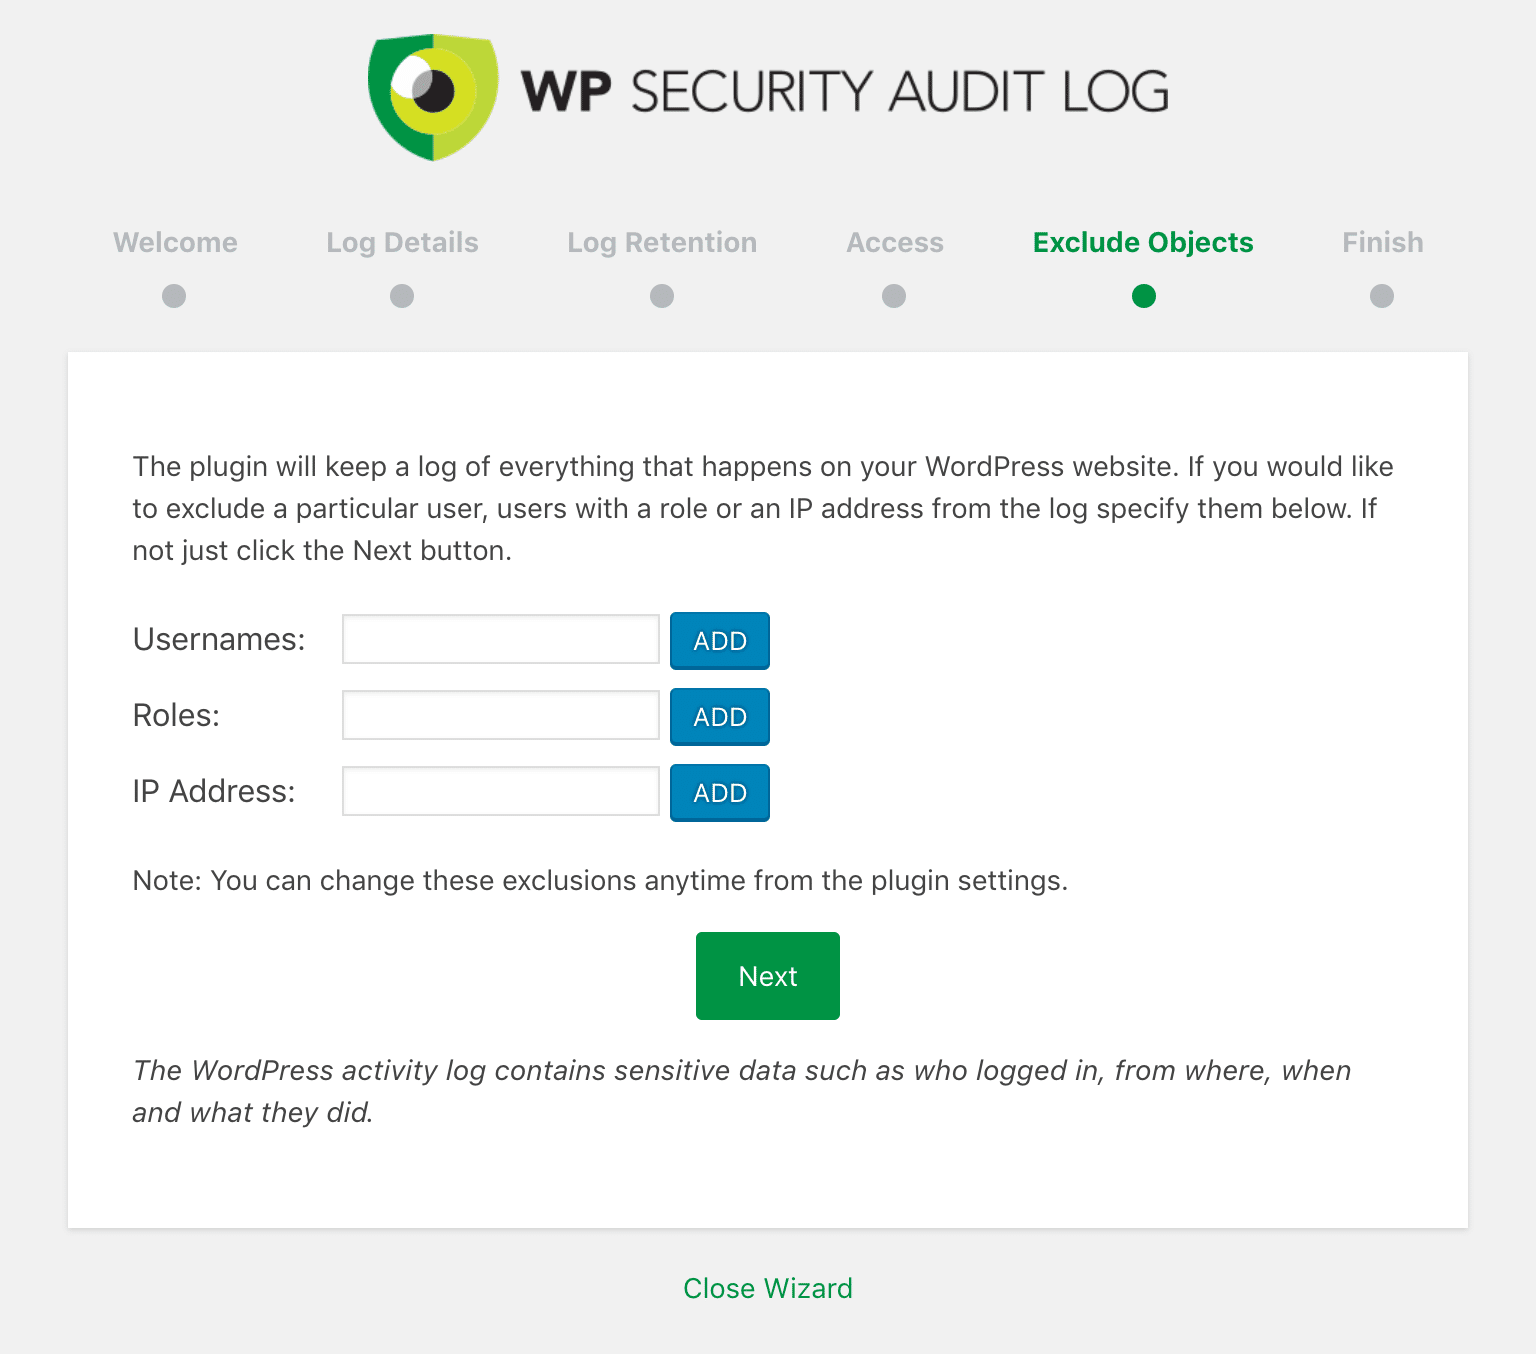 WP Security Audit Log excluir objetos